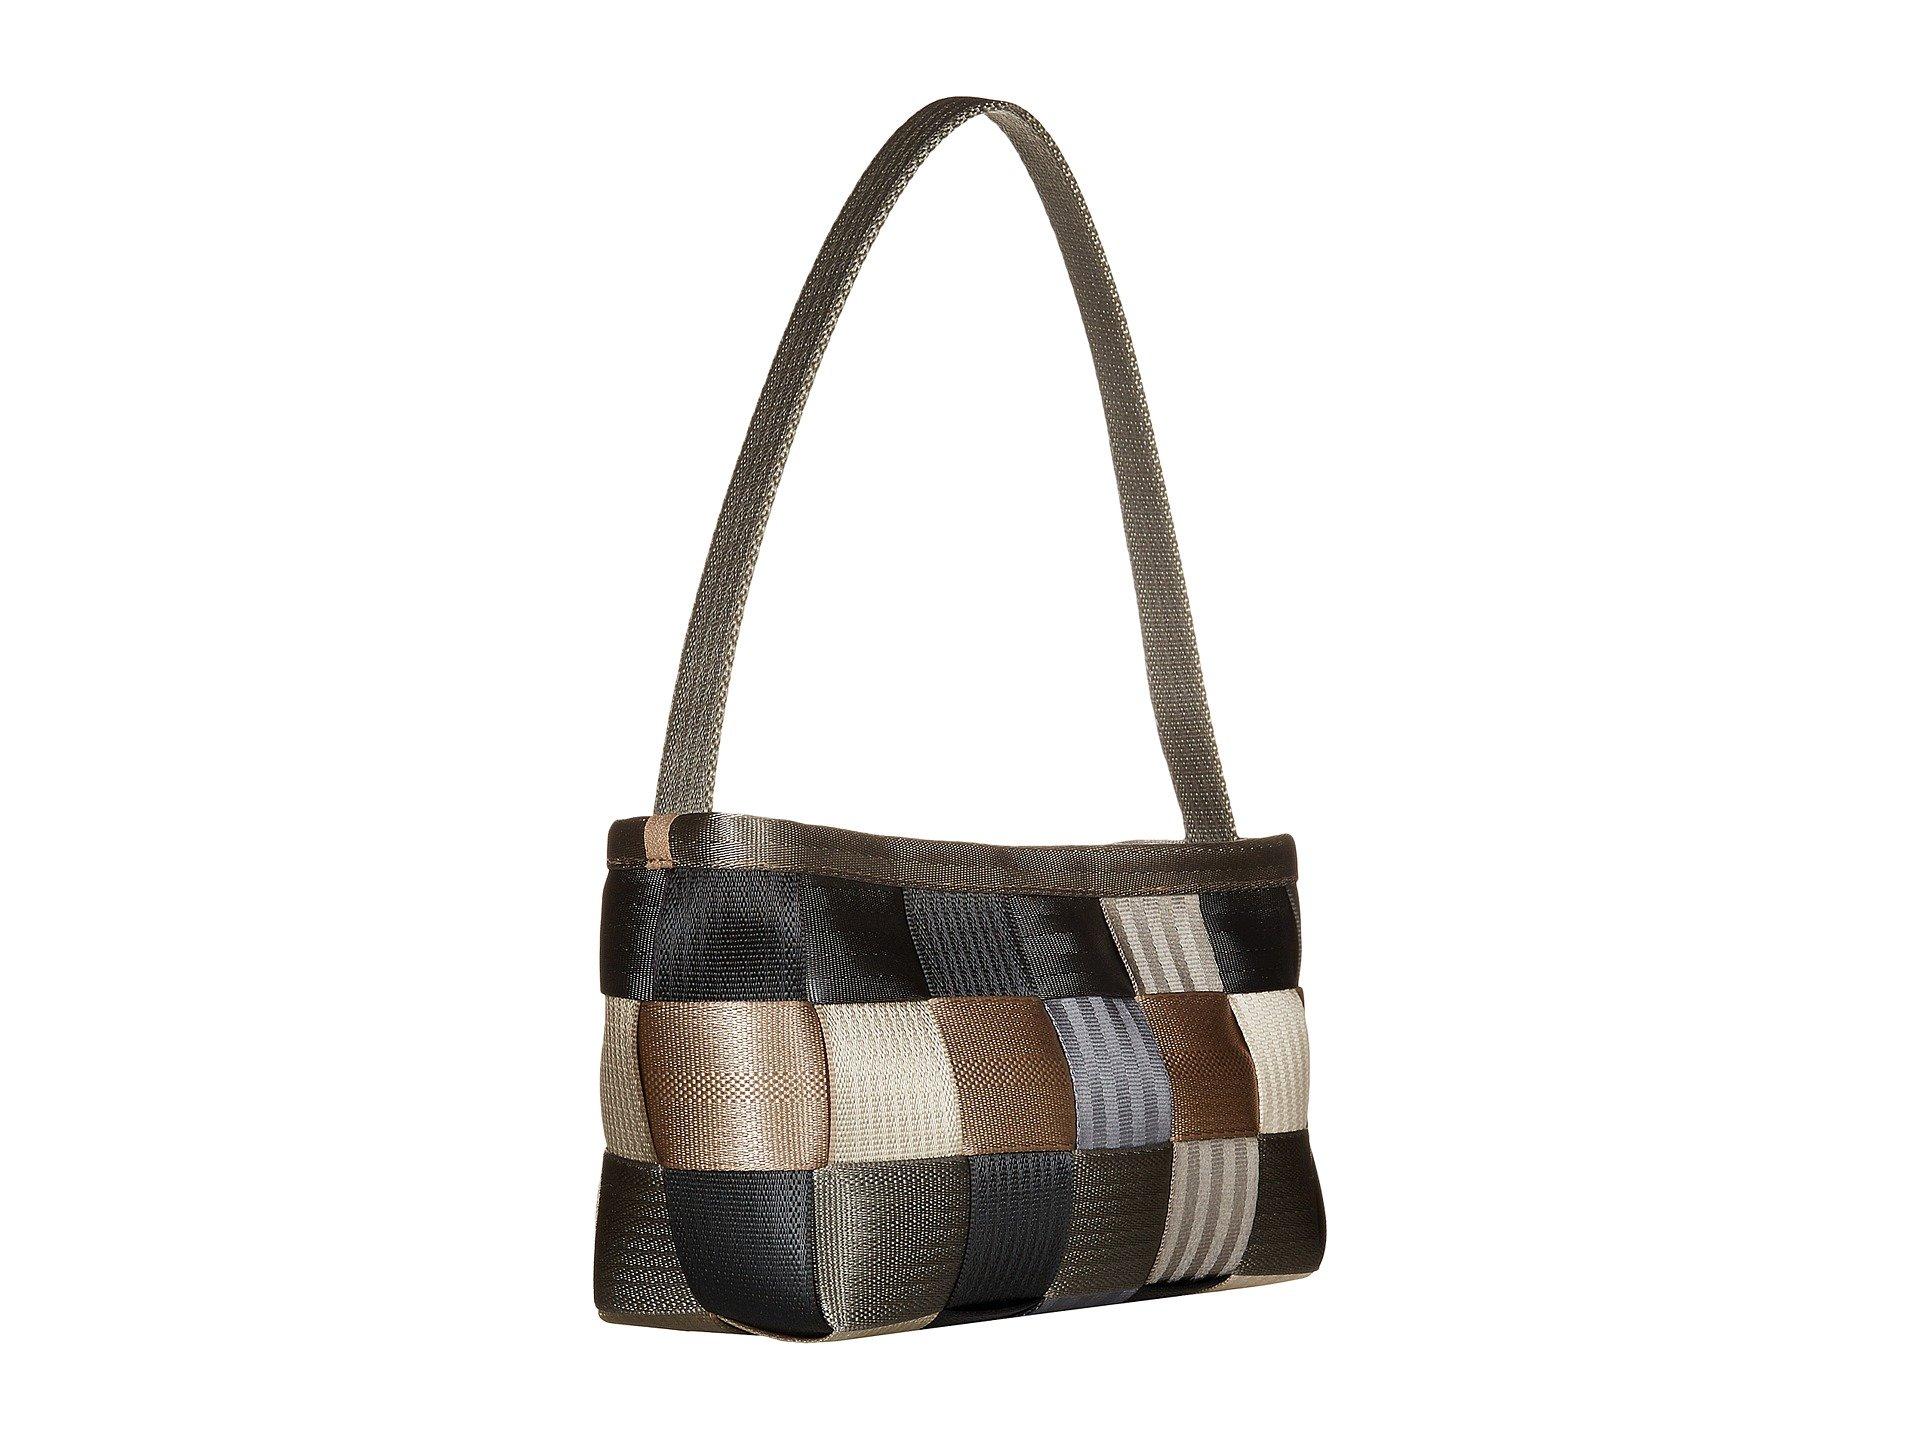 Baguette Treecycle Seatbelt Harveys Bag Harveys Treecycle Harveys Bag Seatbelt Baguette qZdtgWn